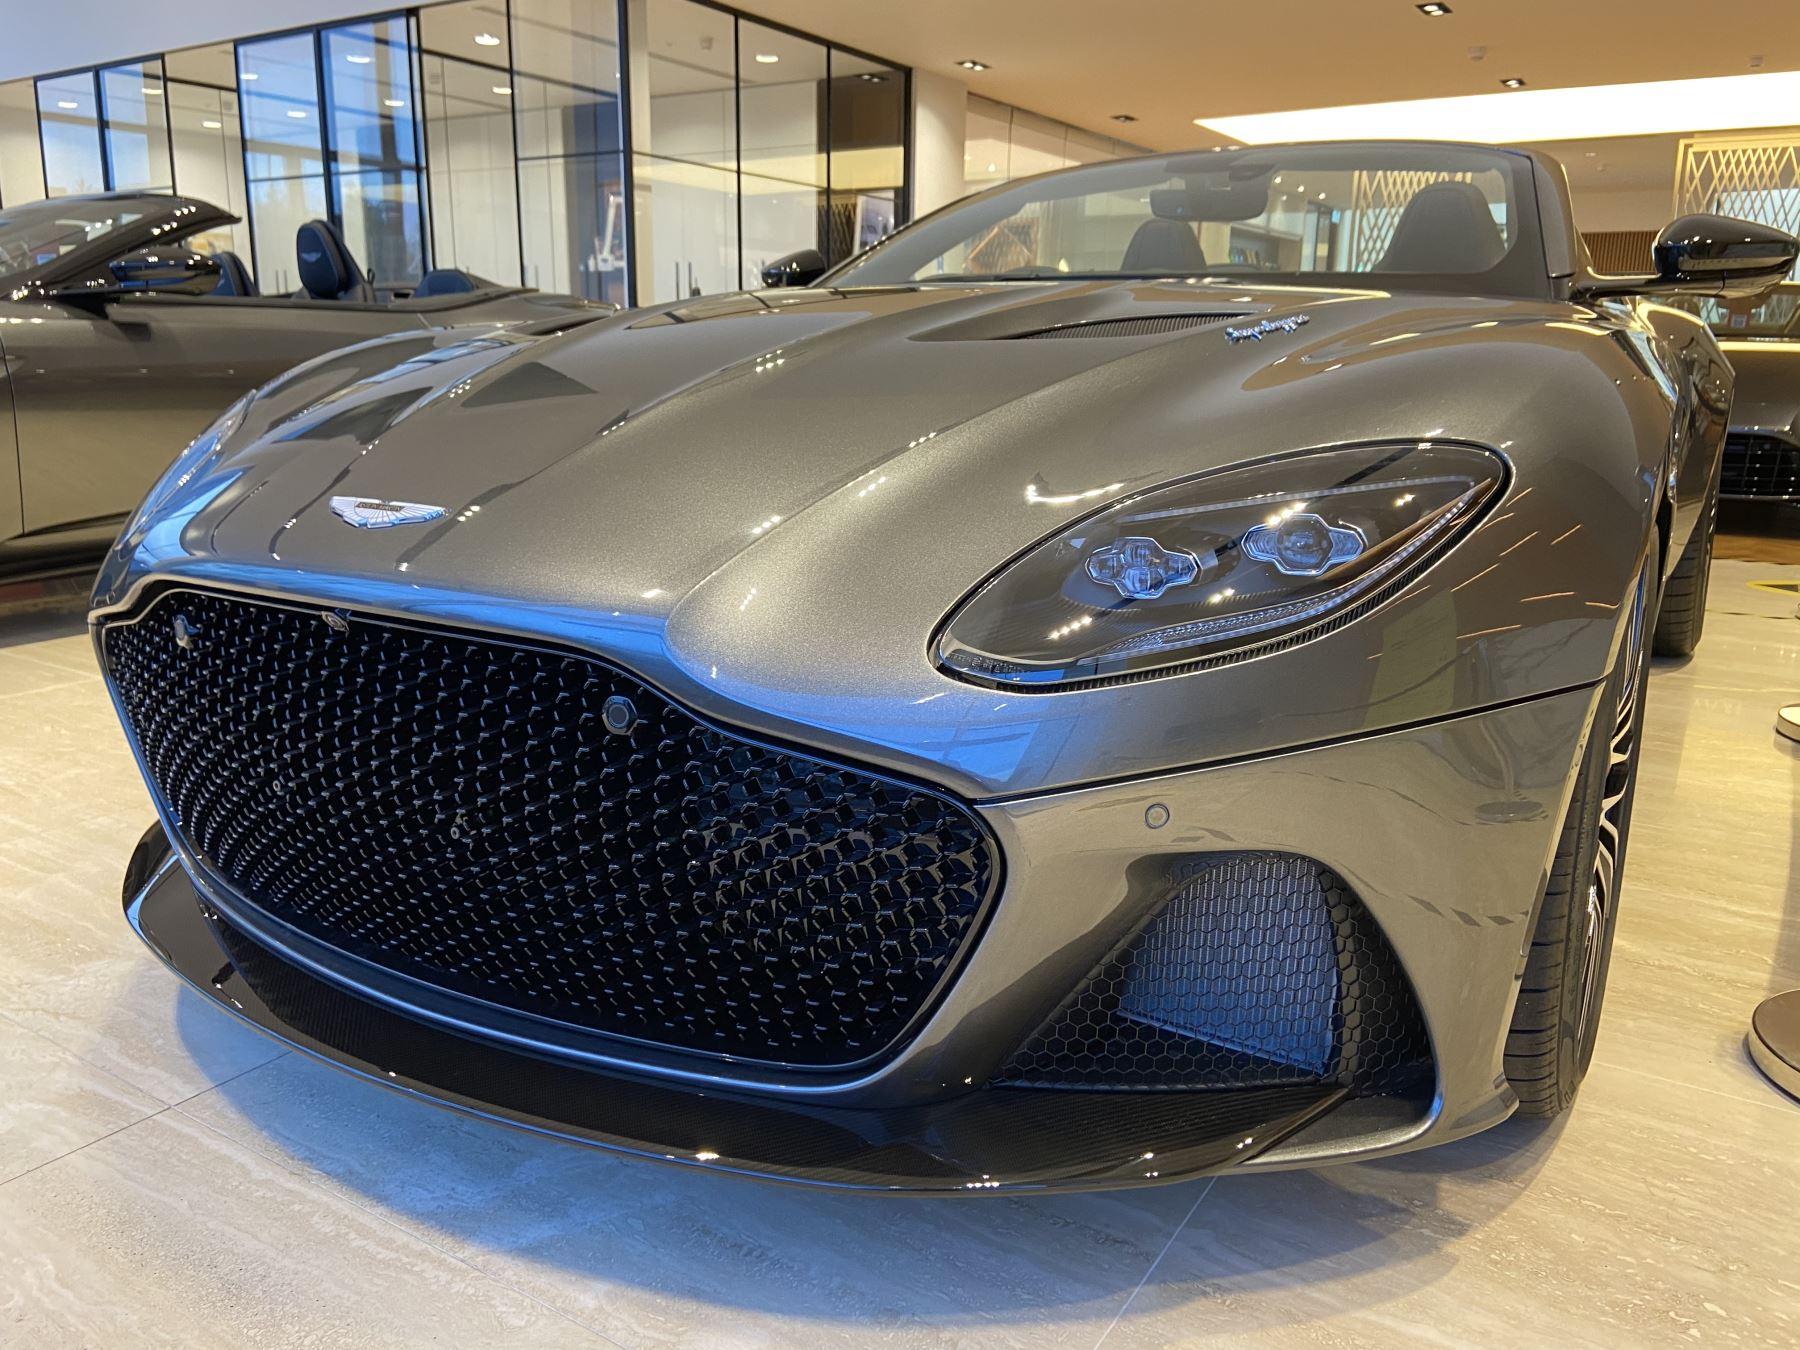 Aston Martin DBS V12 Superleggera Volante Touchtronic image 22